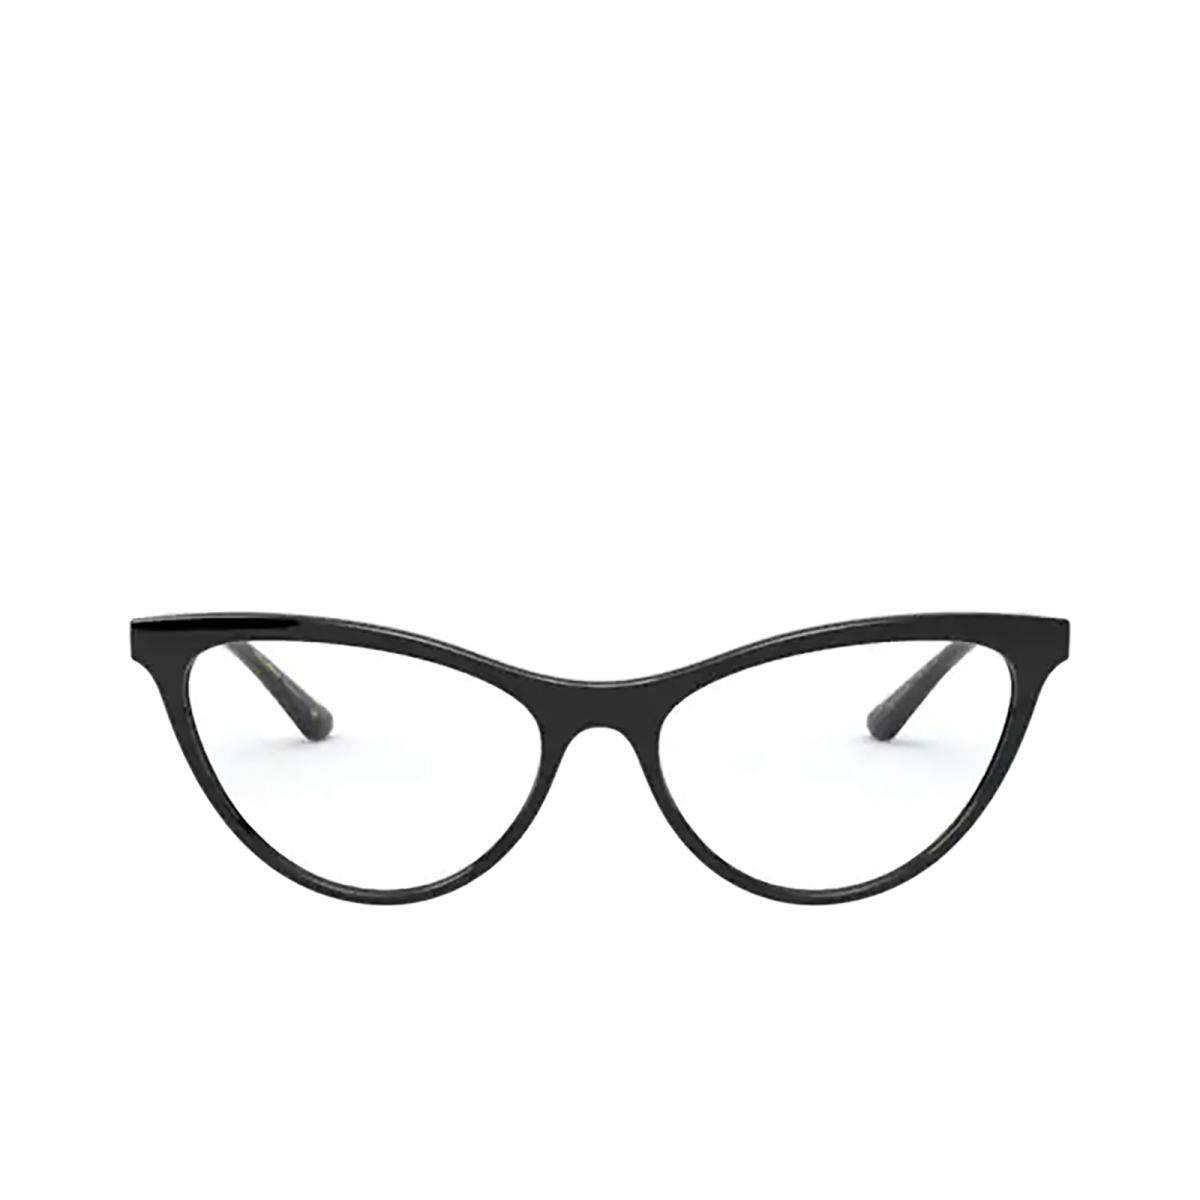 Dolce & Gabbana® Cat-eye Eyeglasses: DG5058 color Black 501.